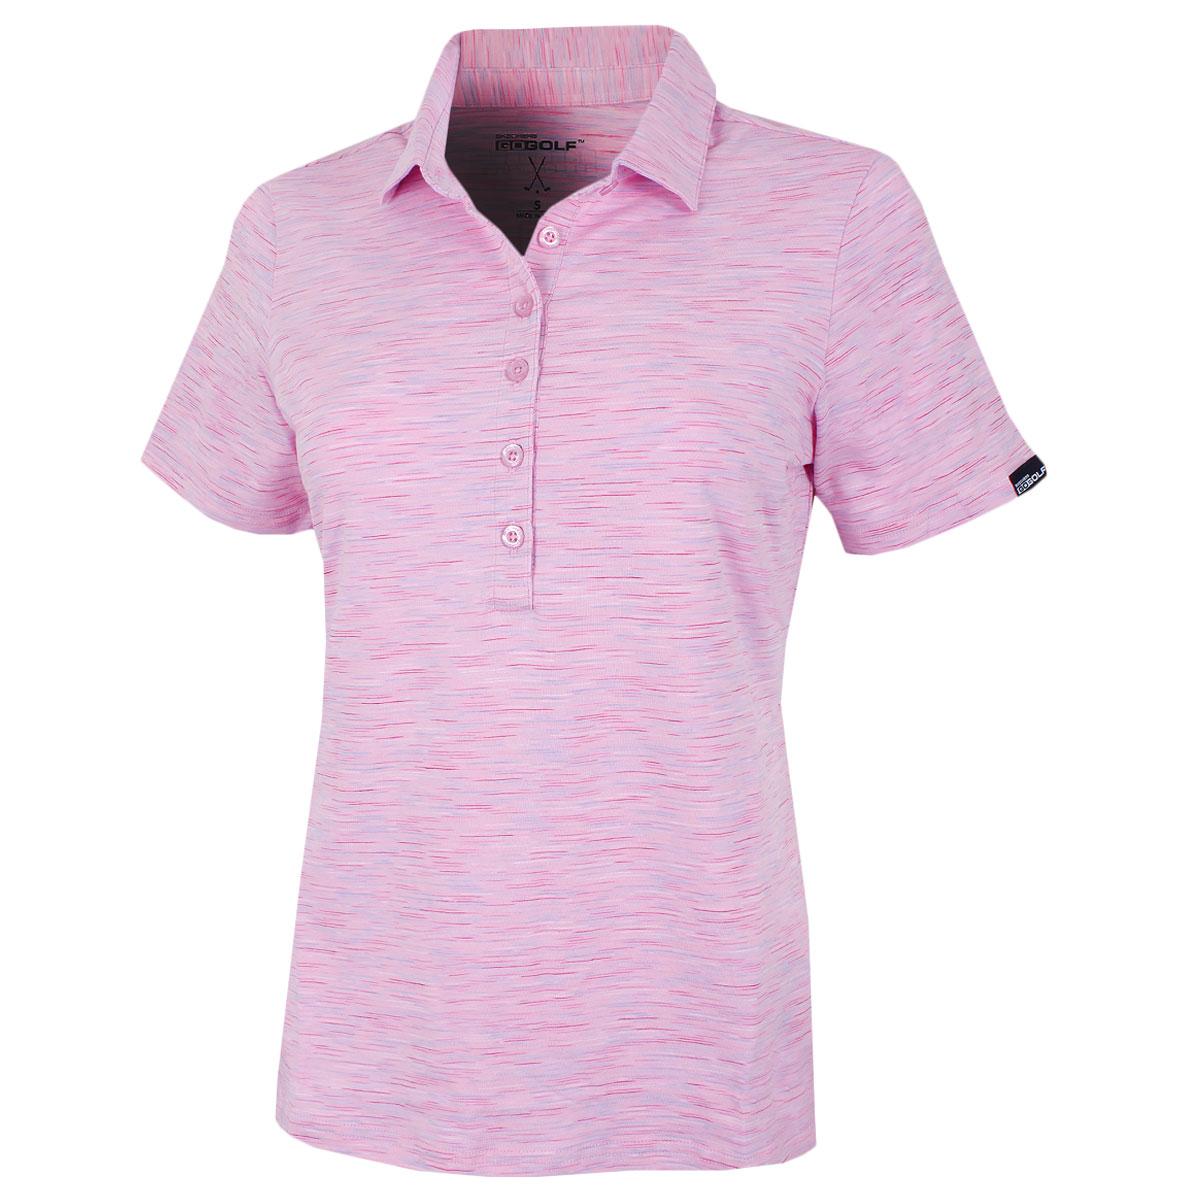 Skechers Golf Womens Space Dye Cotton